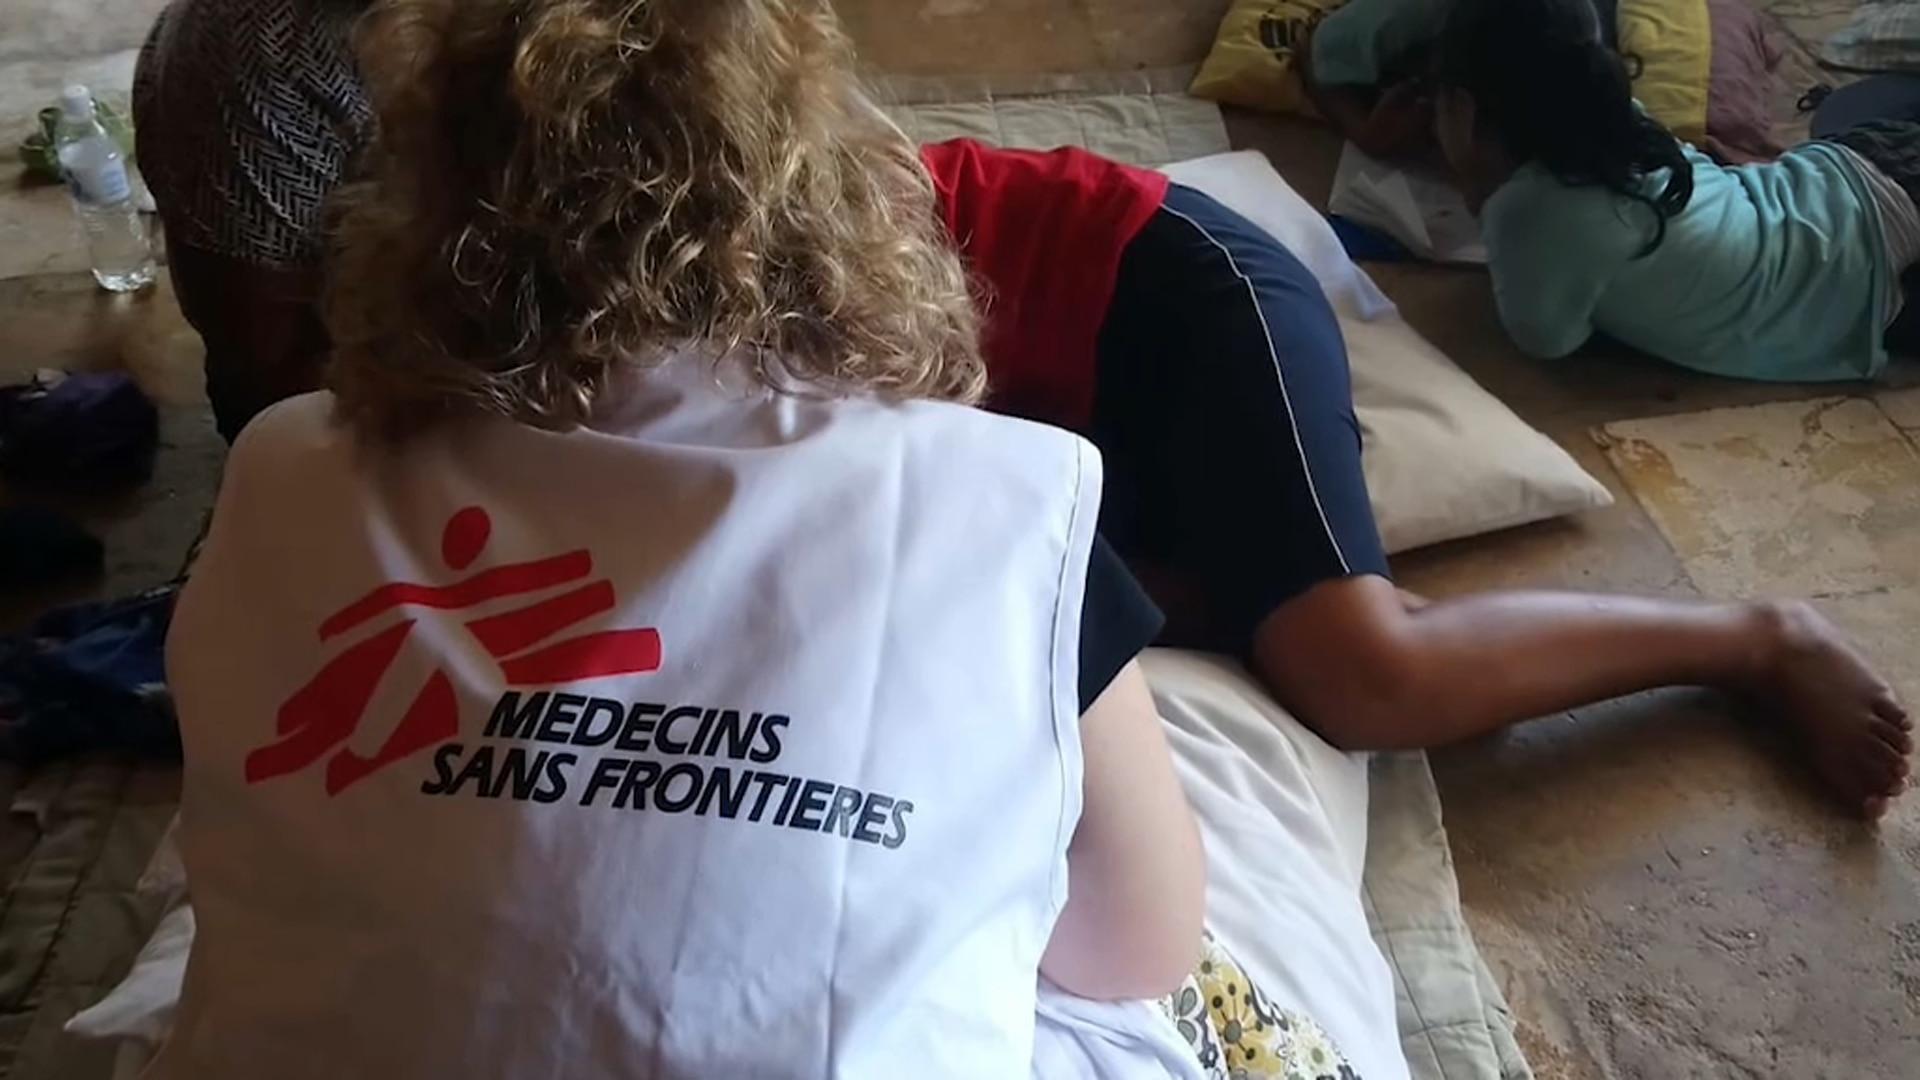 Medecins Sans Frontiers (MSF) have been ordered out of Nauru.